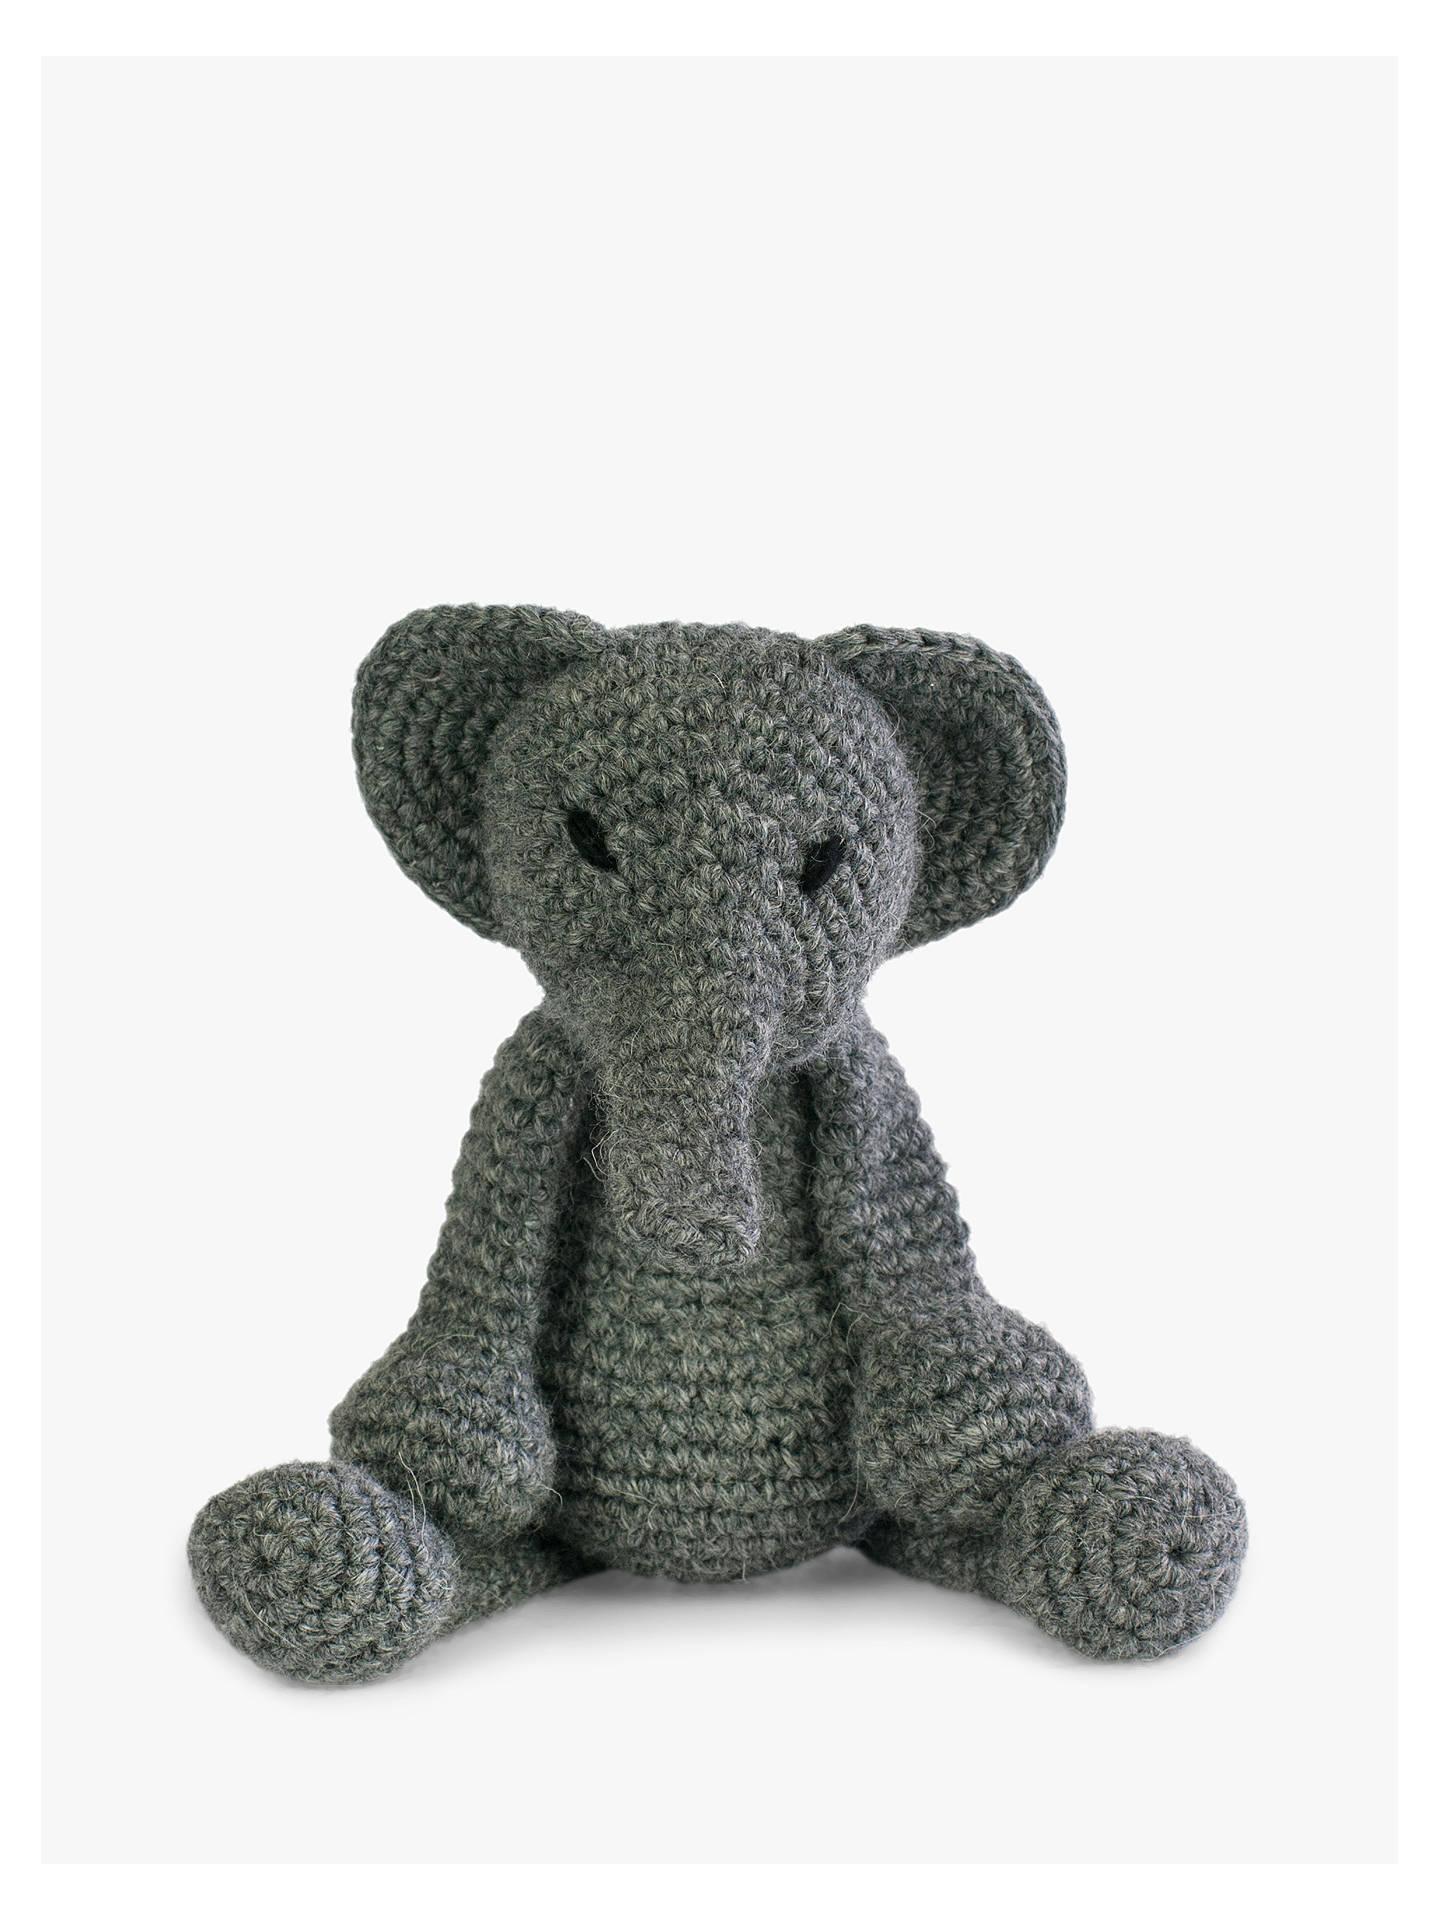 CROCHET PATTERN Josefina and Jeffery Big Amigurumi Elephants PDF ... | 1920x1440